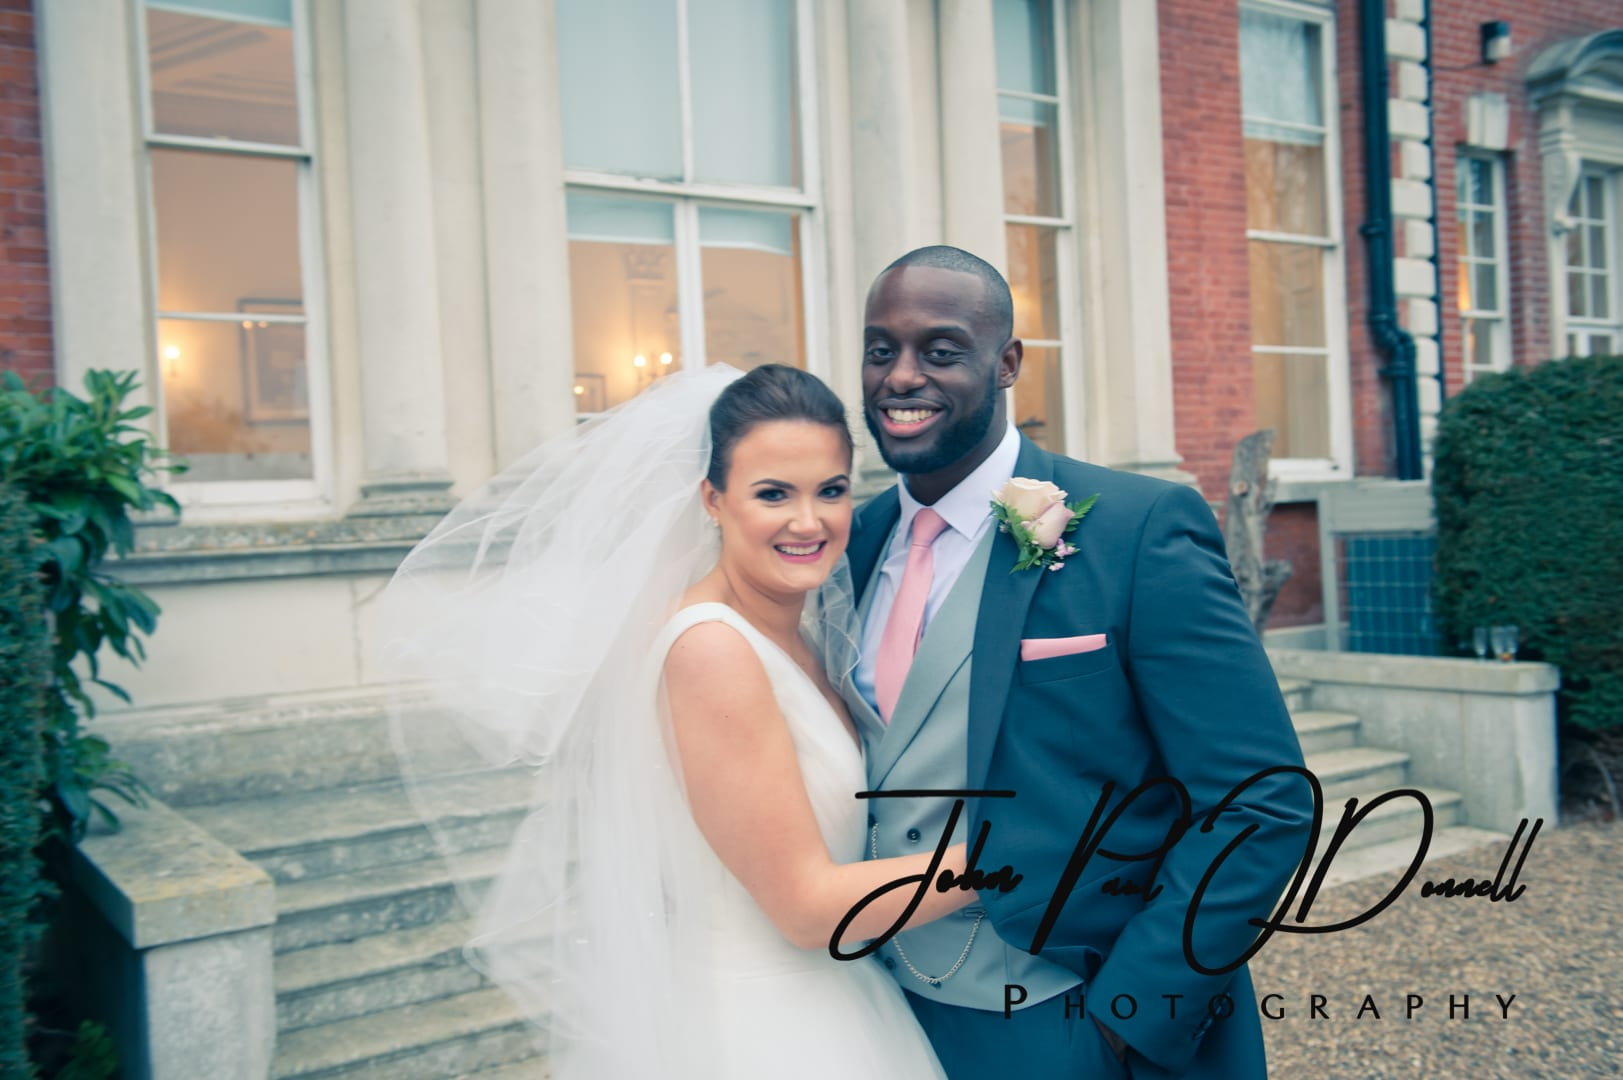 Megan and Christophers wedding at Theobalds Park Mansion